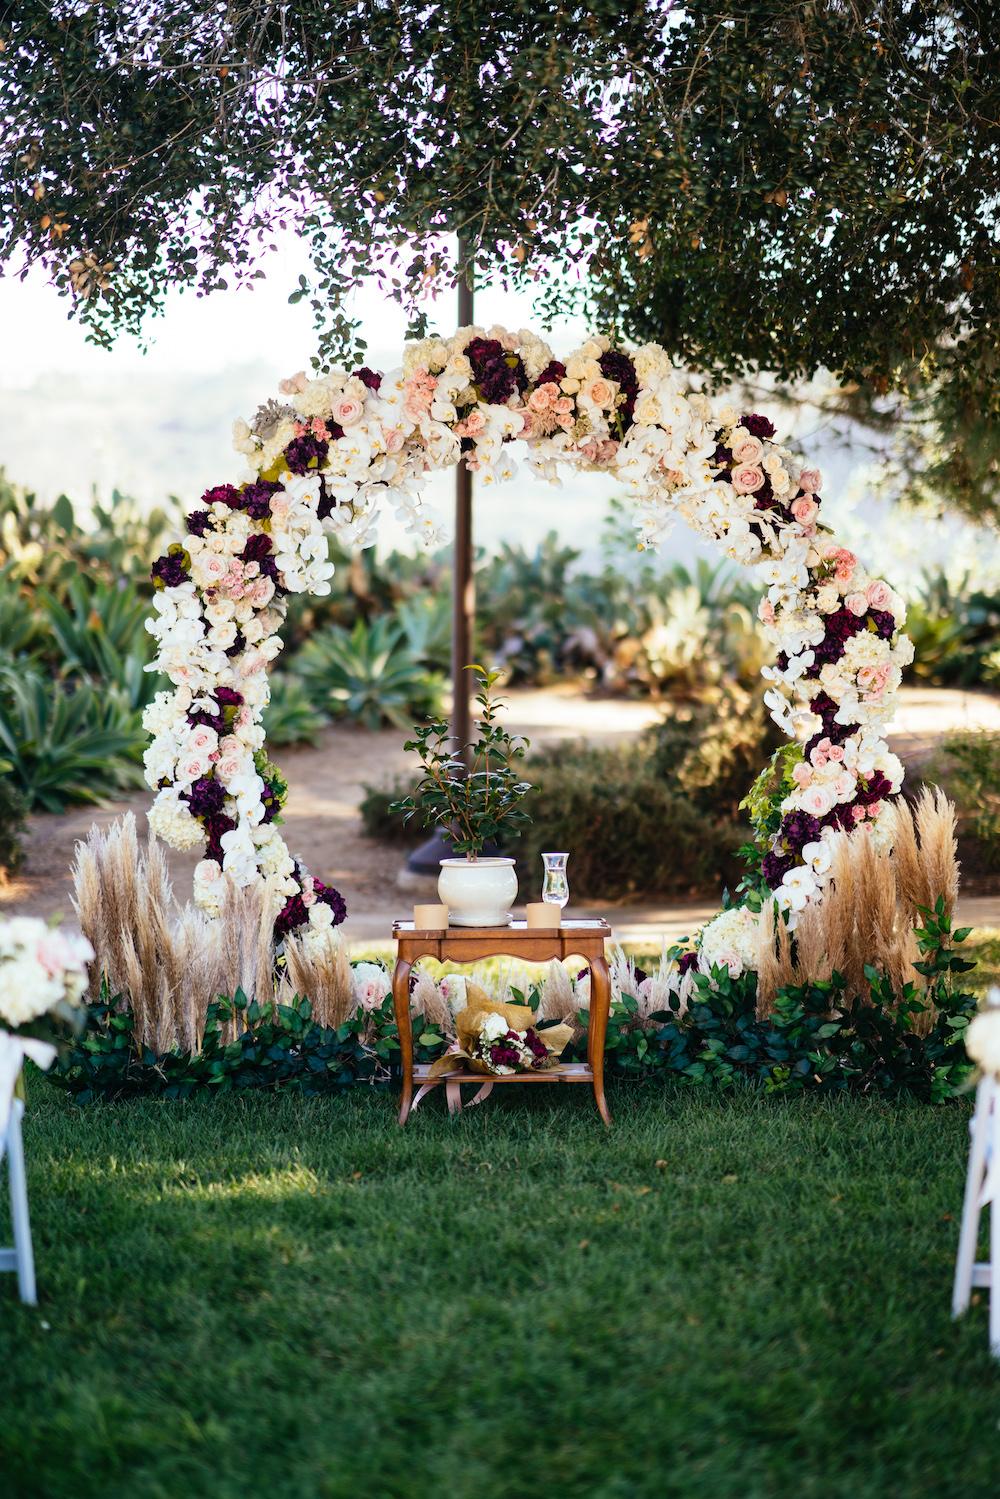 11 Beautiful Decor Ideas for a Garden-Inspired Wedding – Dobrina Zhekova